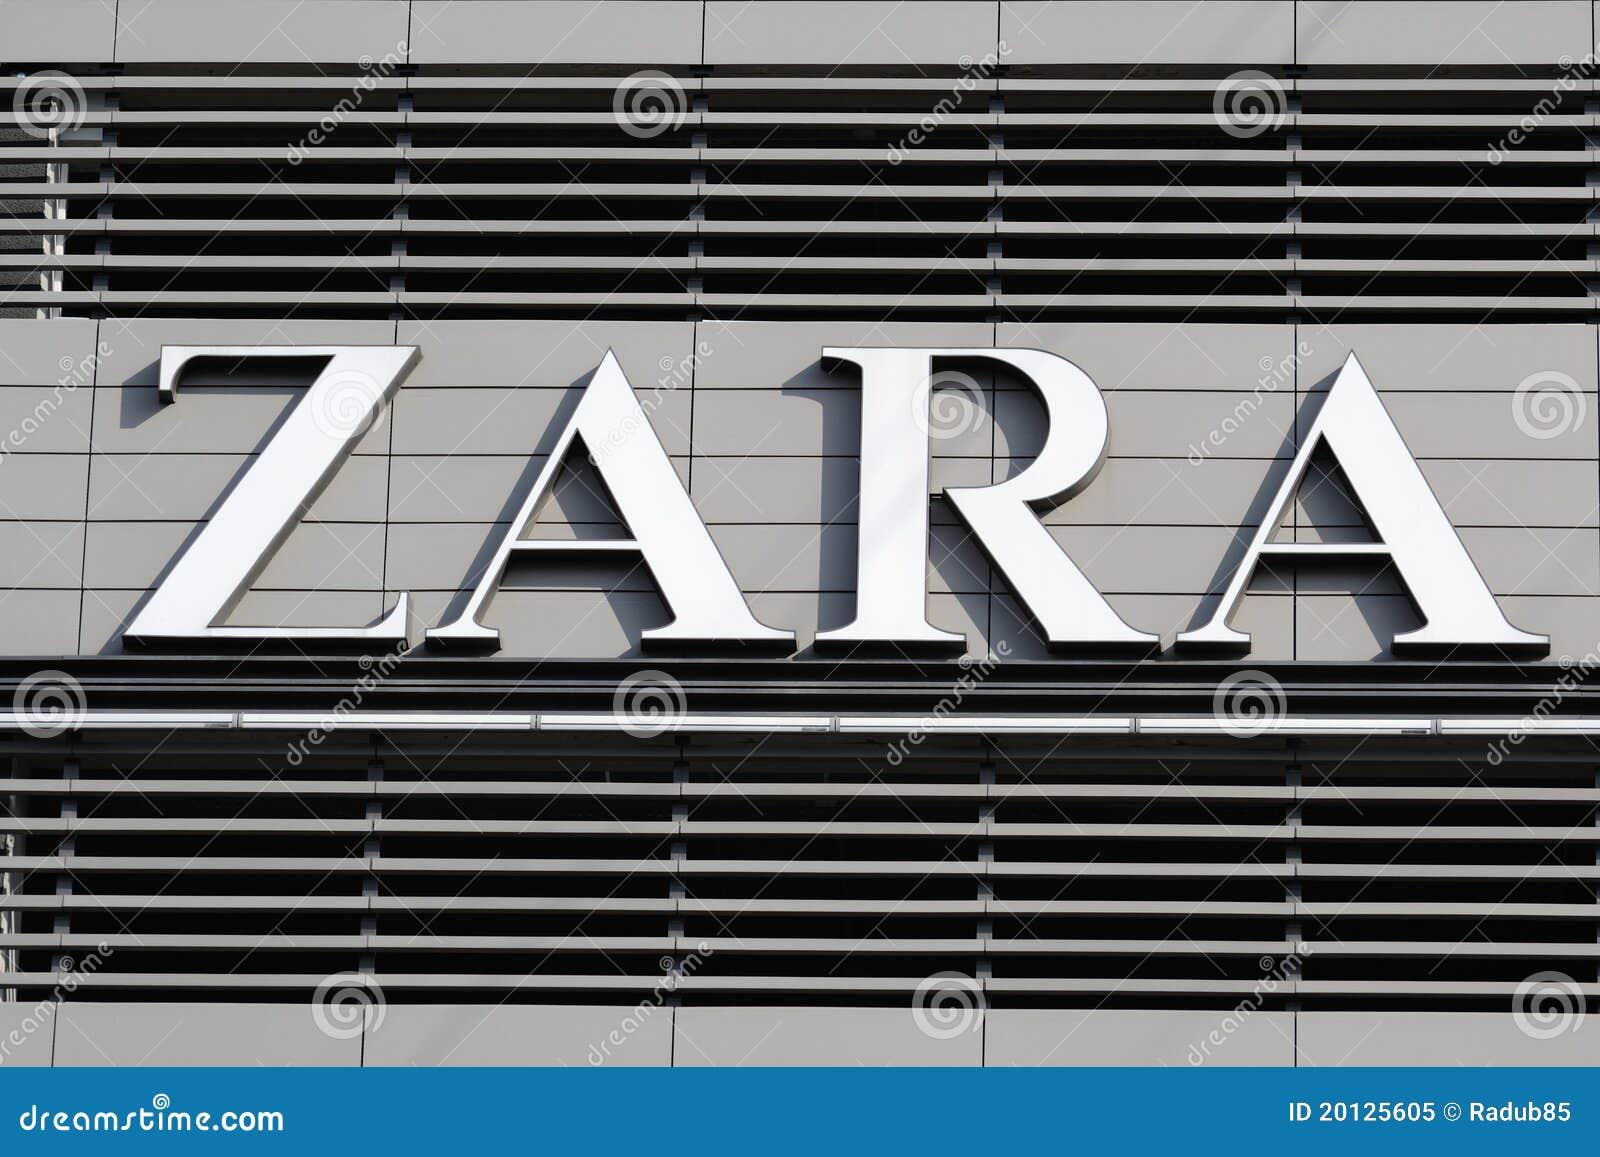 Best Home Goods Stores Zara Logo Editorial Image Image 20125605